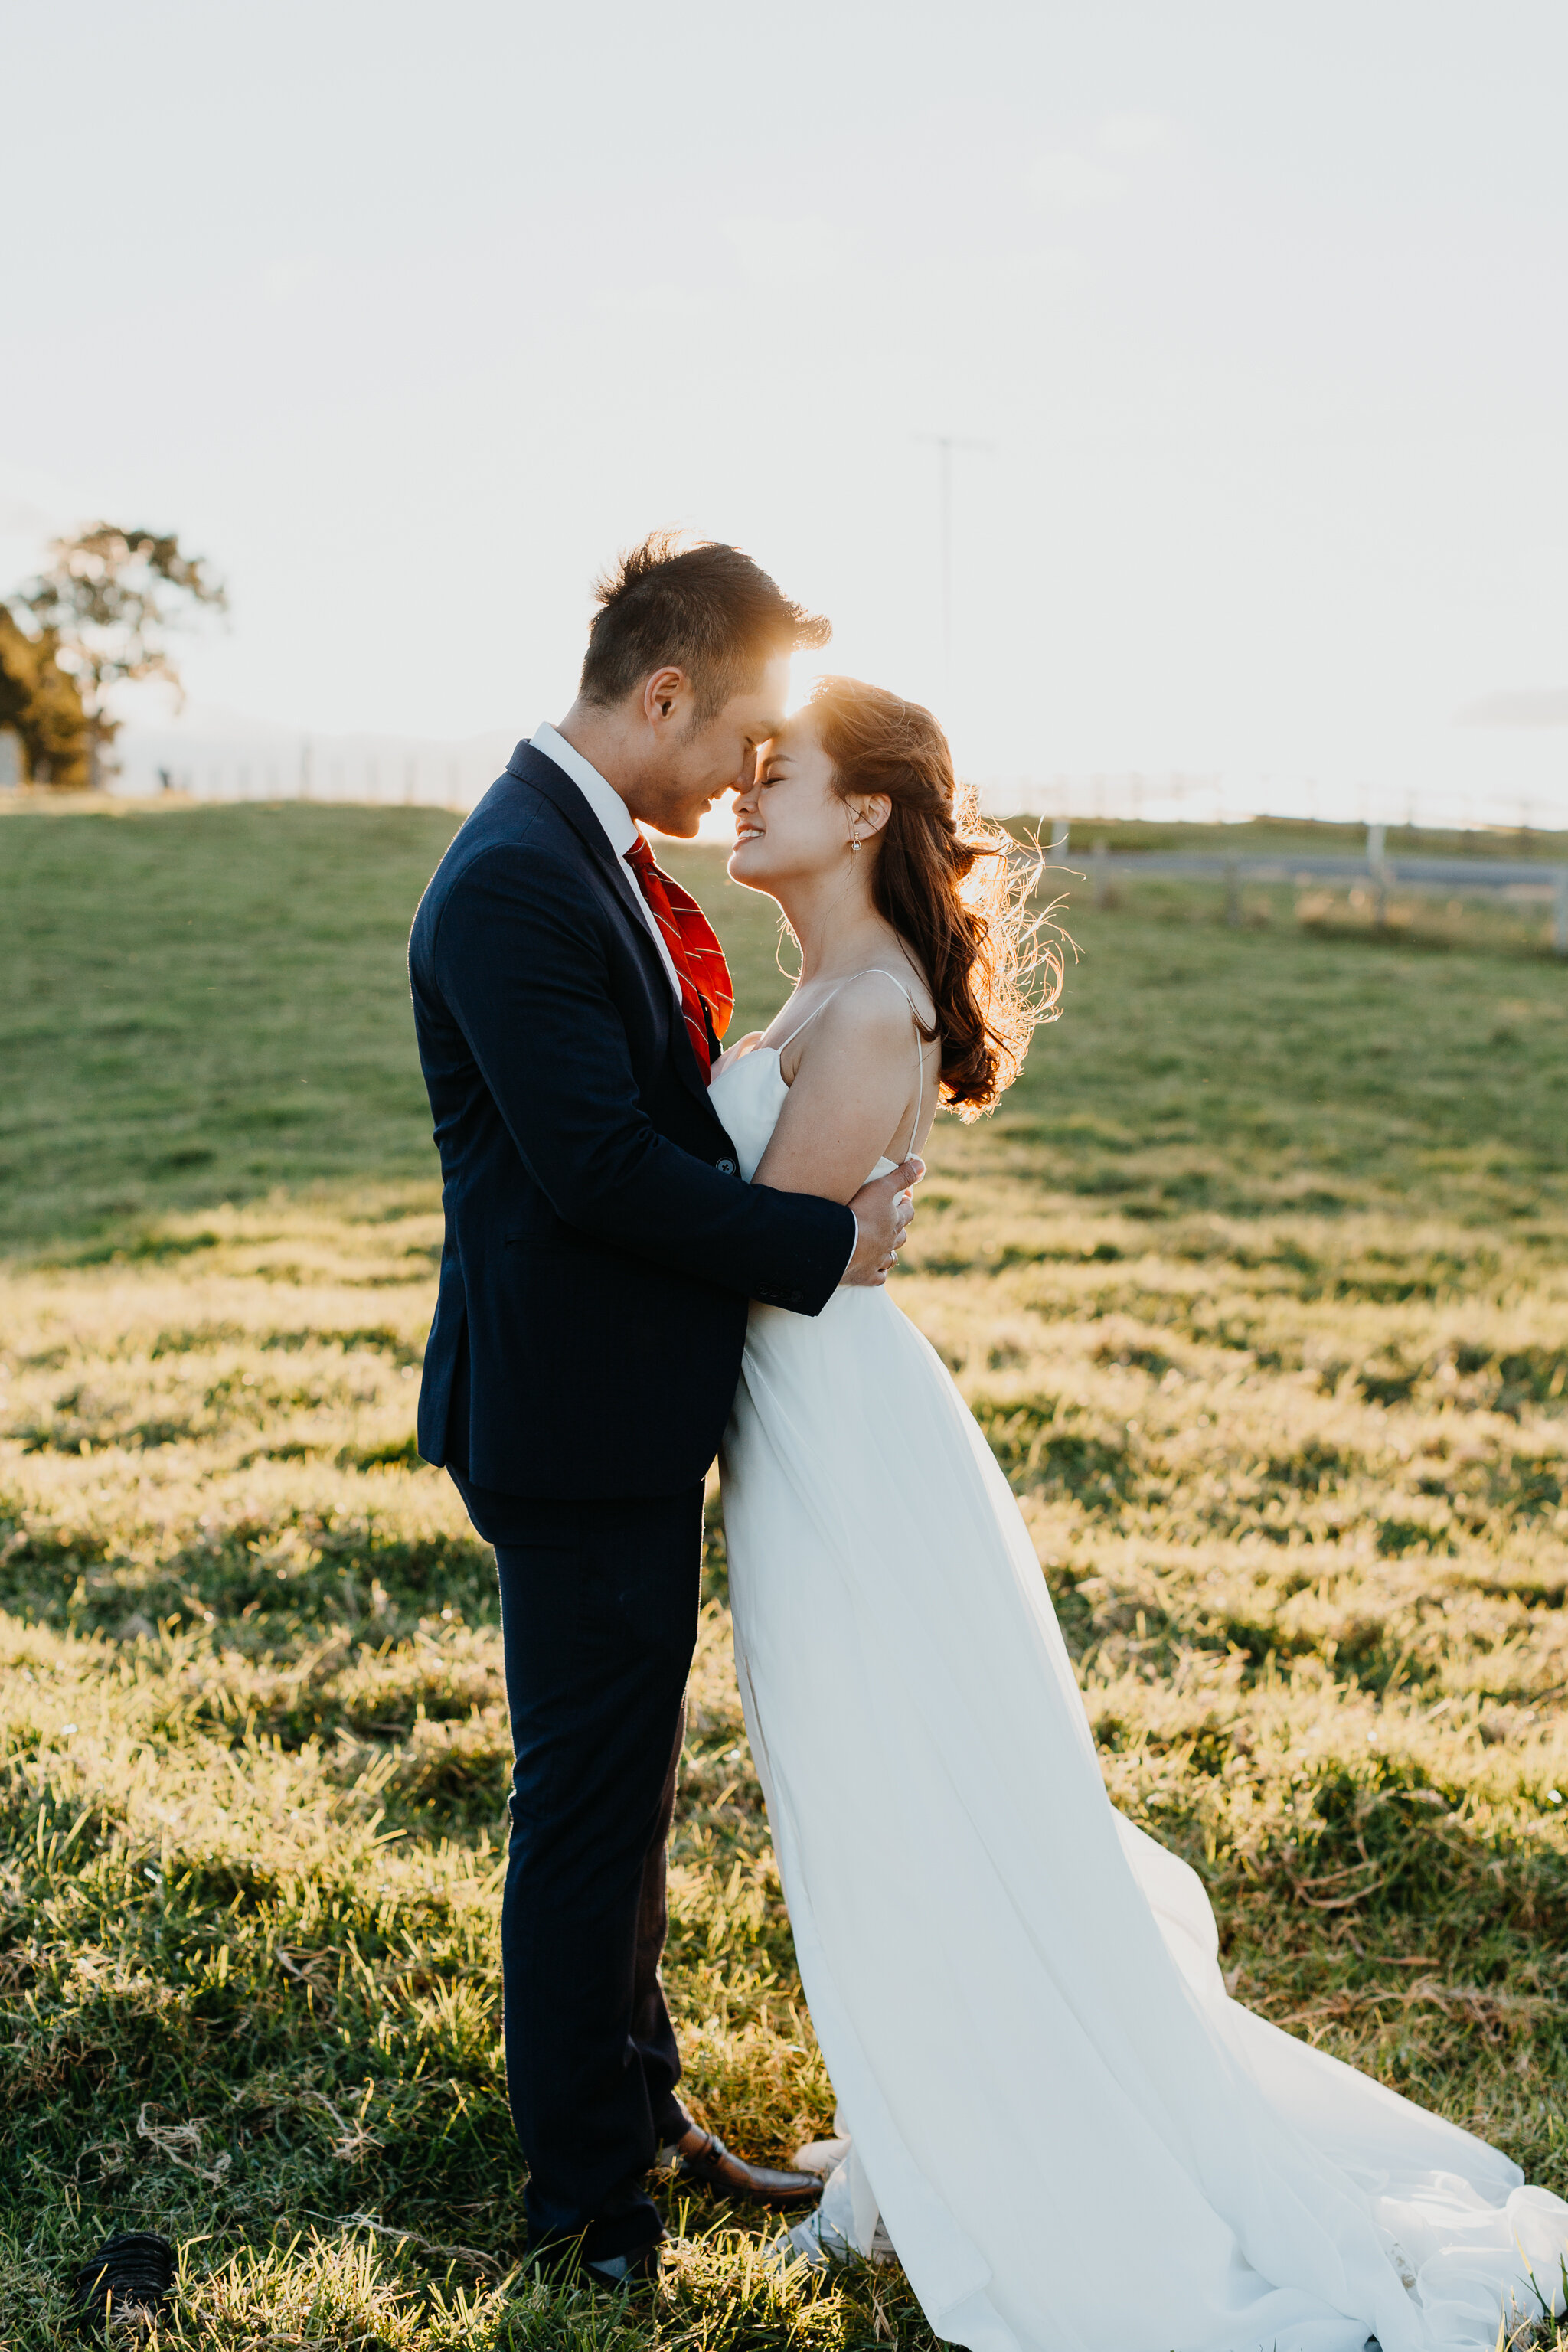 Maleny One Tree Hill Wedding - Maleny Wedding Photographer-20.jpg